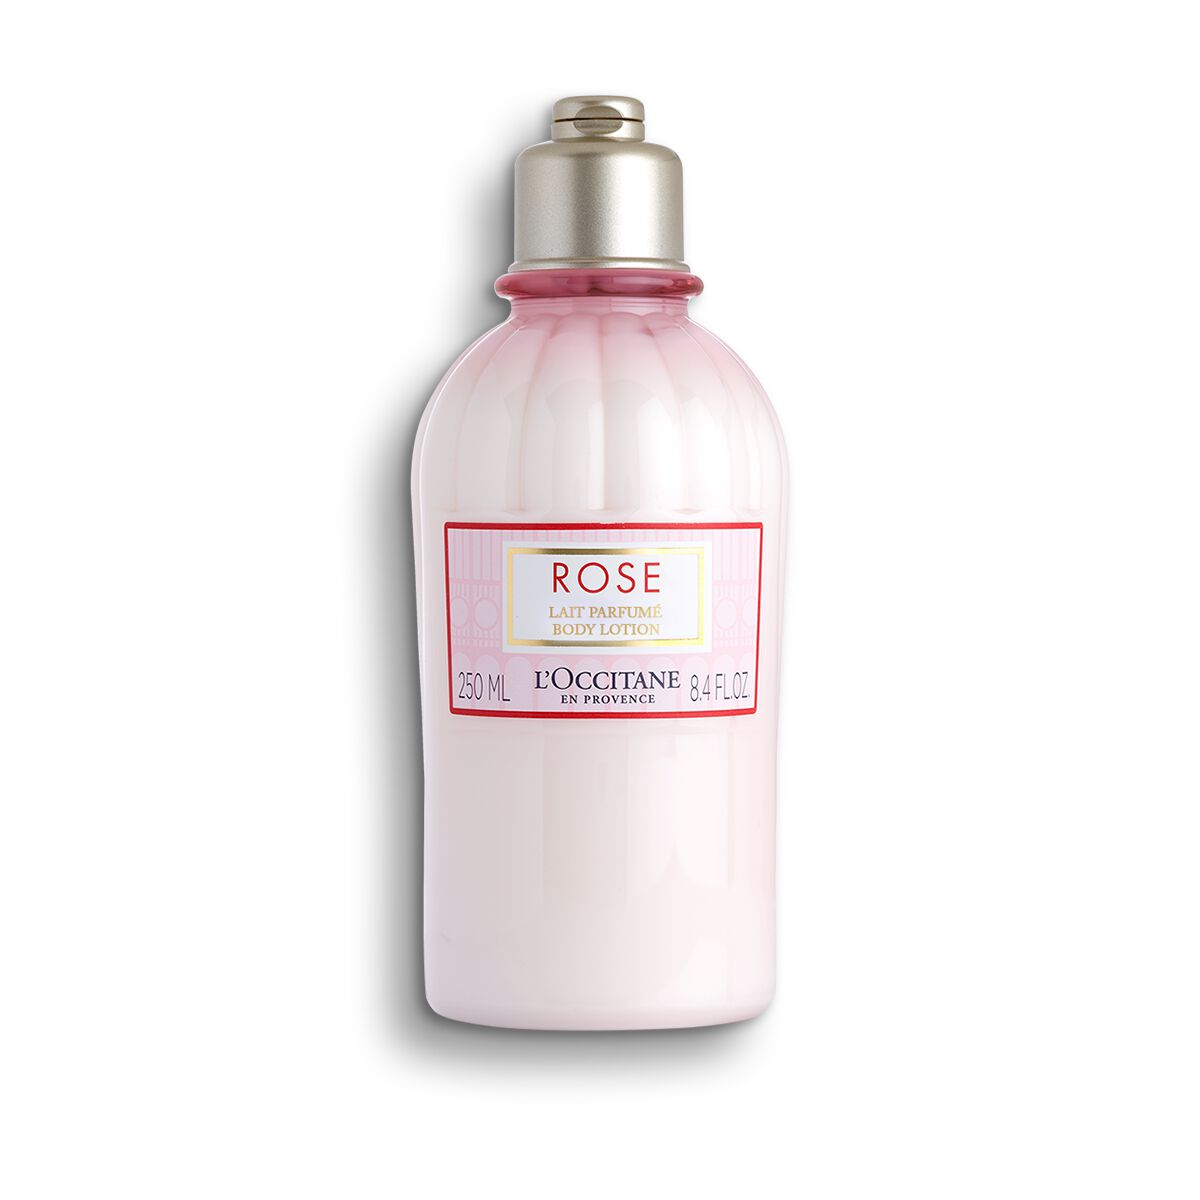 Rose Body Lotion 250 ml. - L'OCCITANE